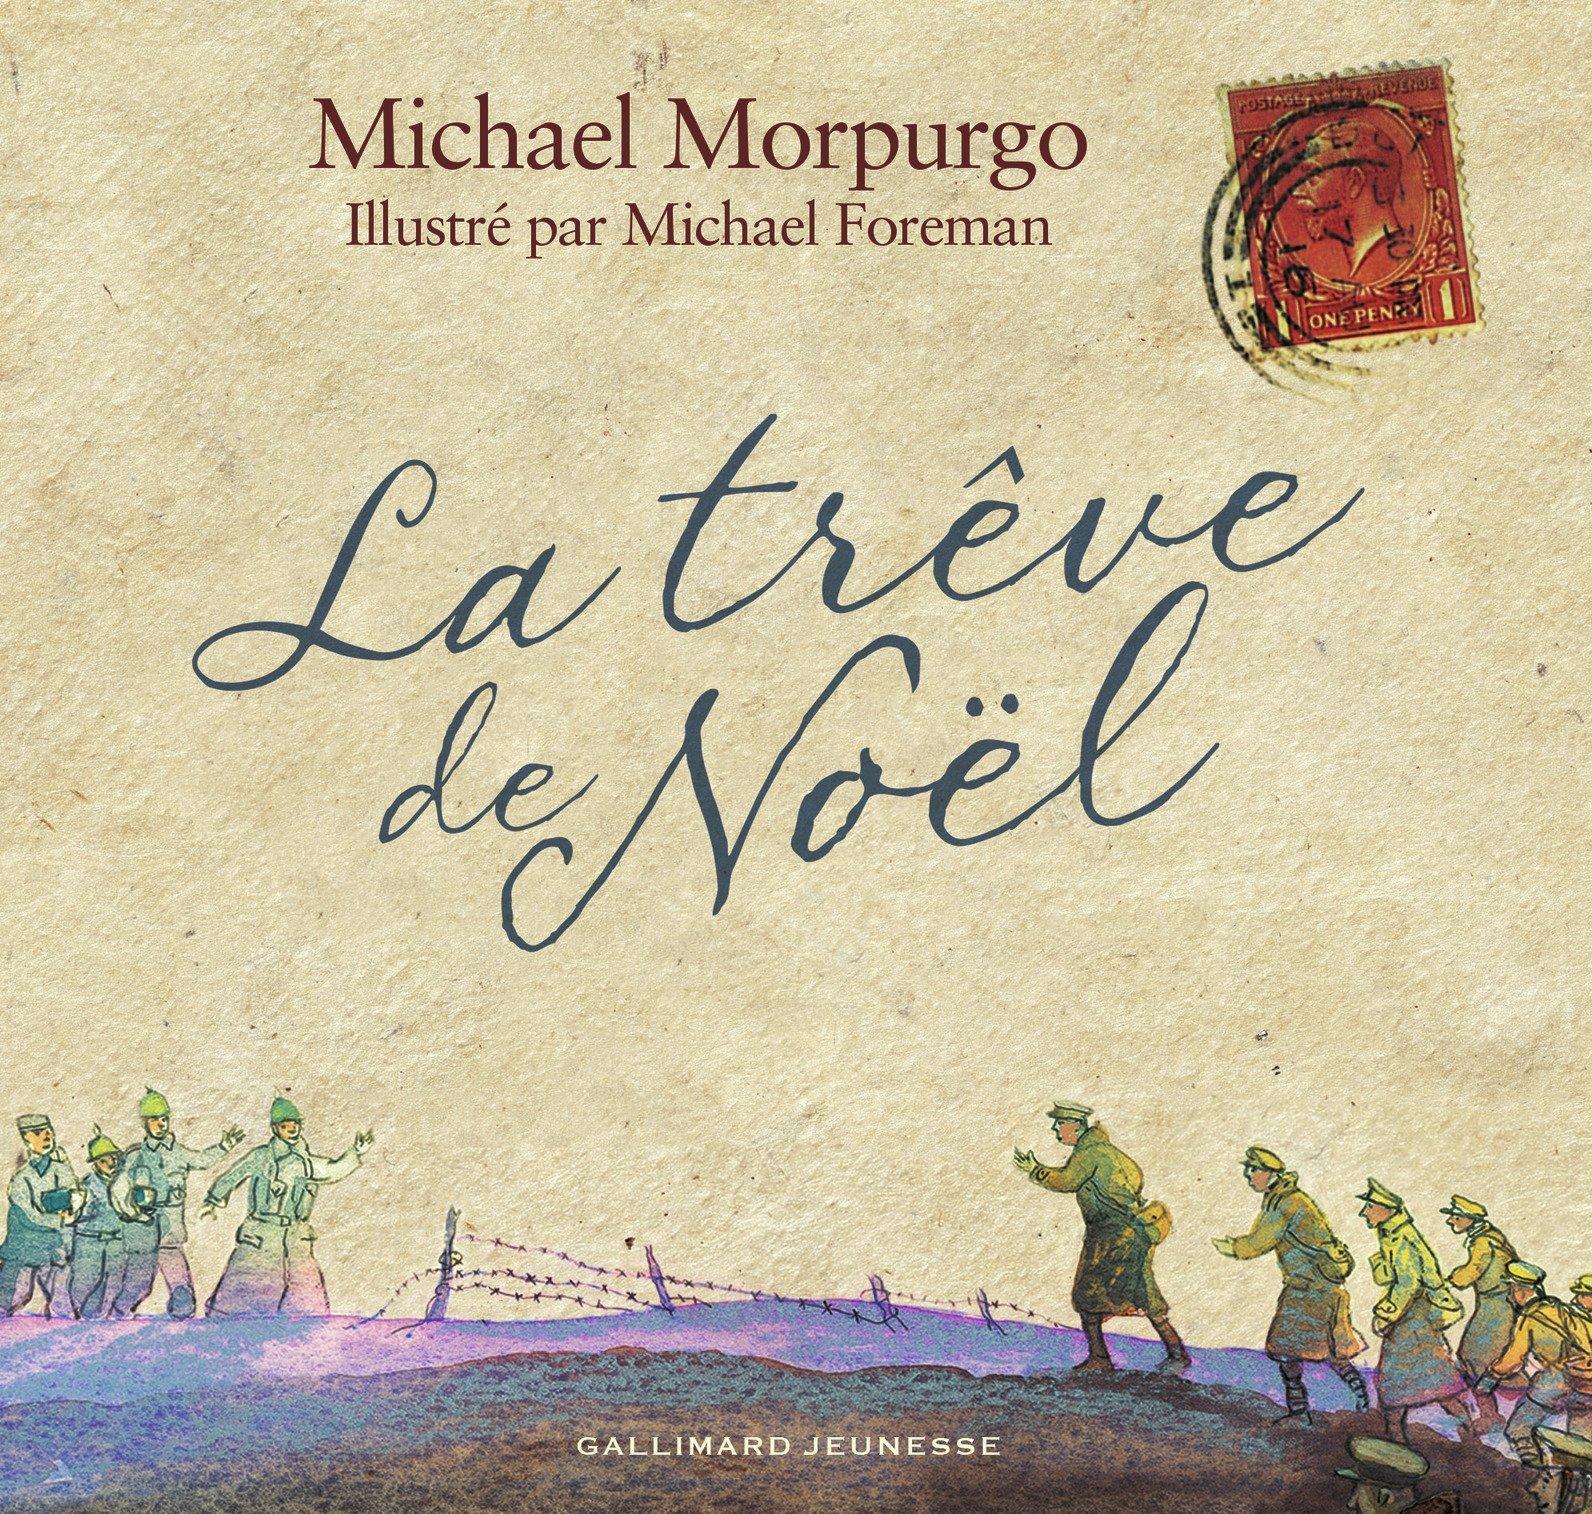 La trêve de Noël Album – 25 octobre 2018 Michael Morpurgo Michael Foreman Catherine Gibert Gallimard Jeunesse